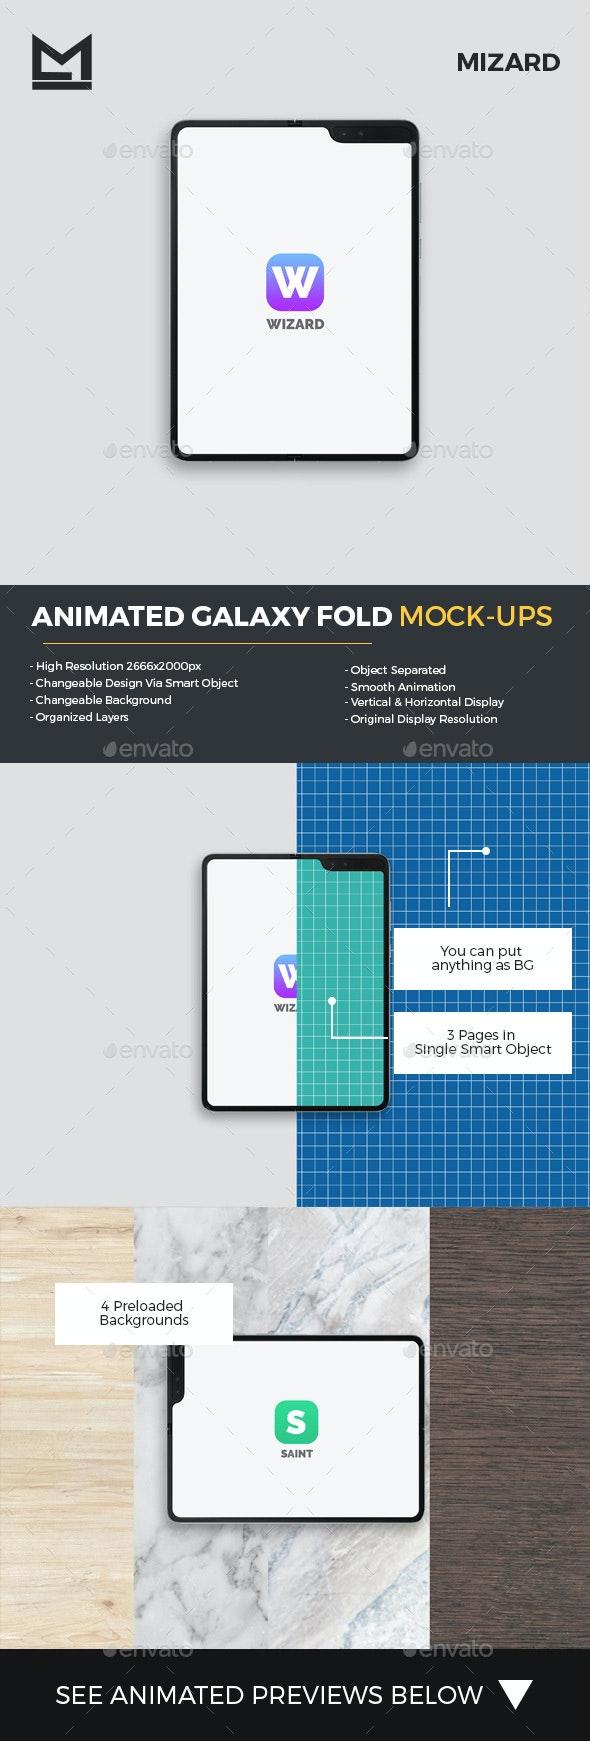 Animated Fold Galaxy Mockup - Mobile Displays